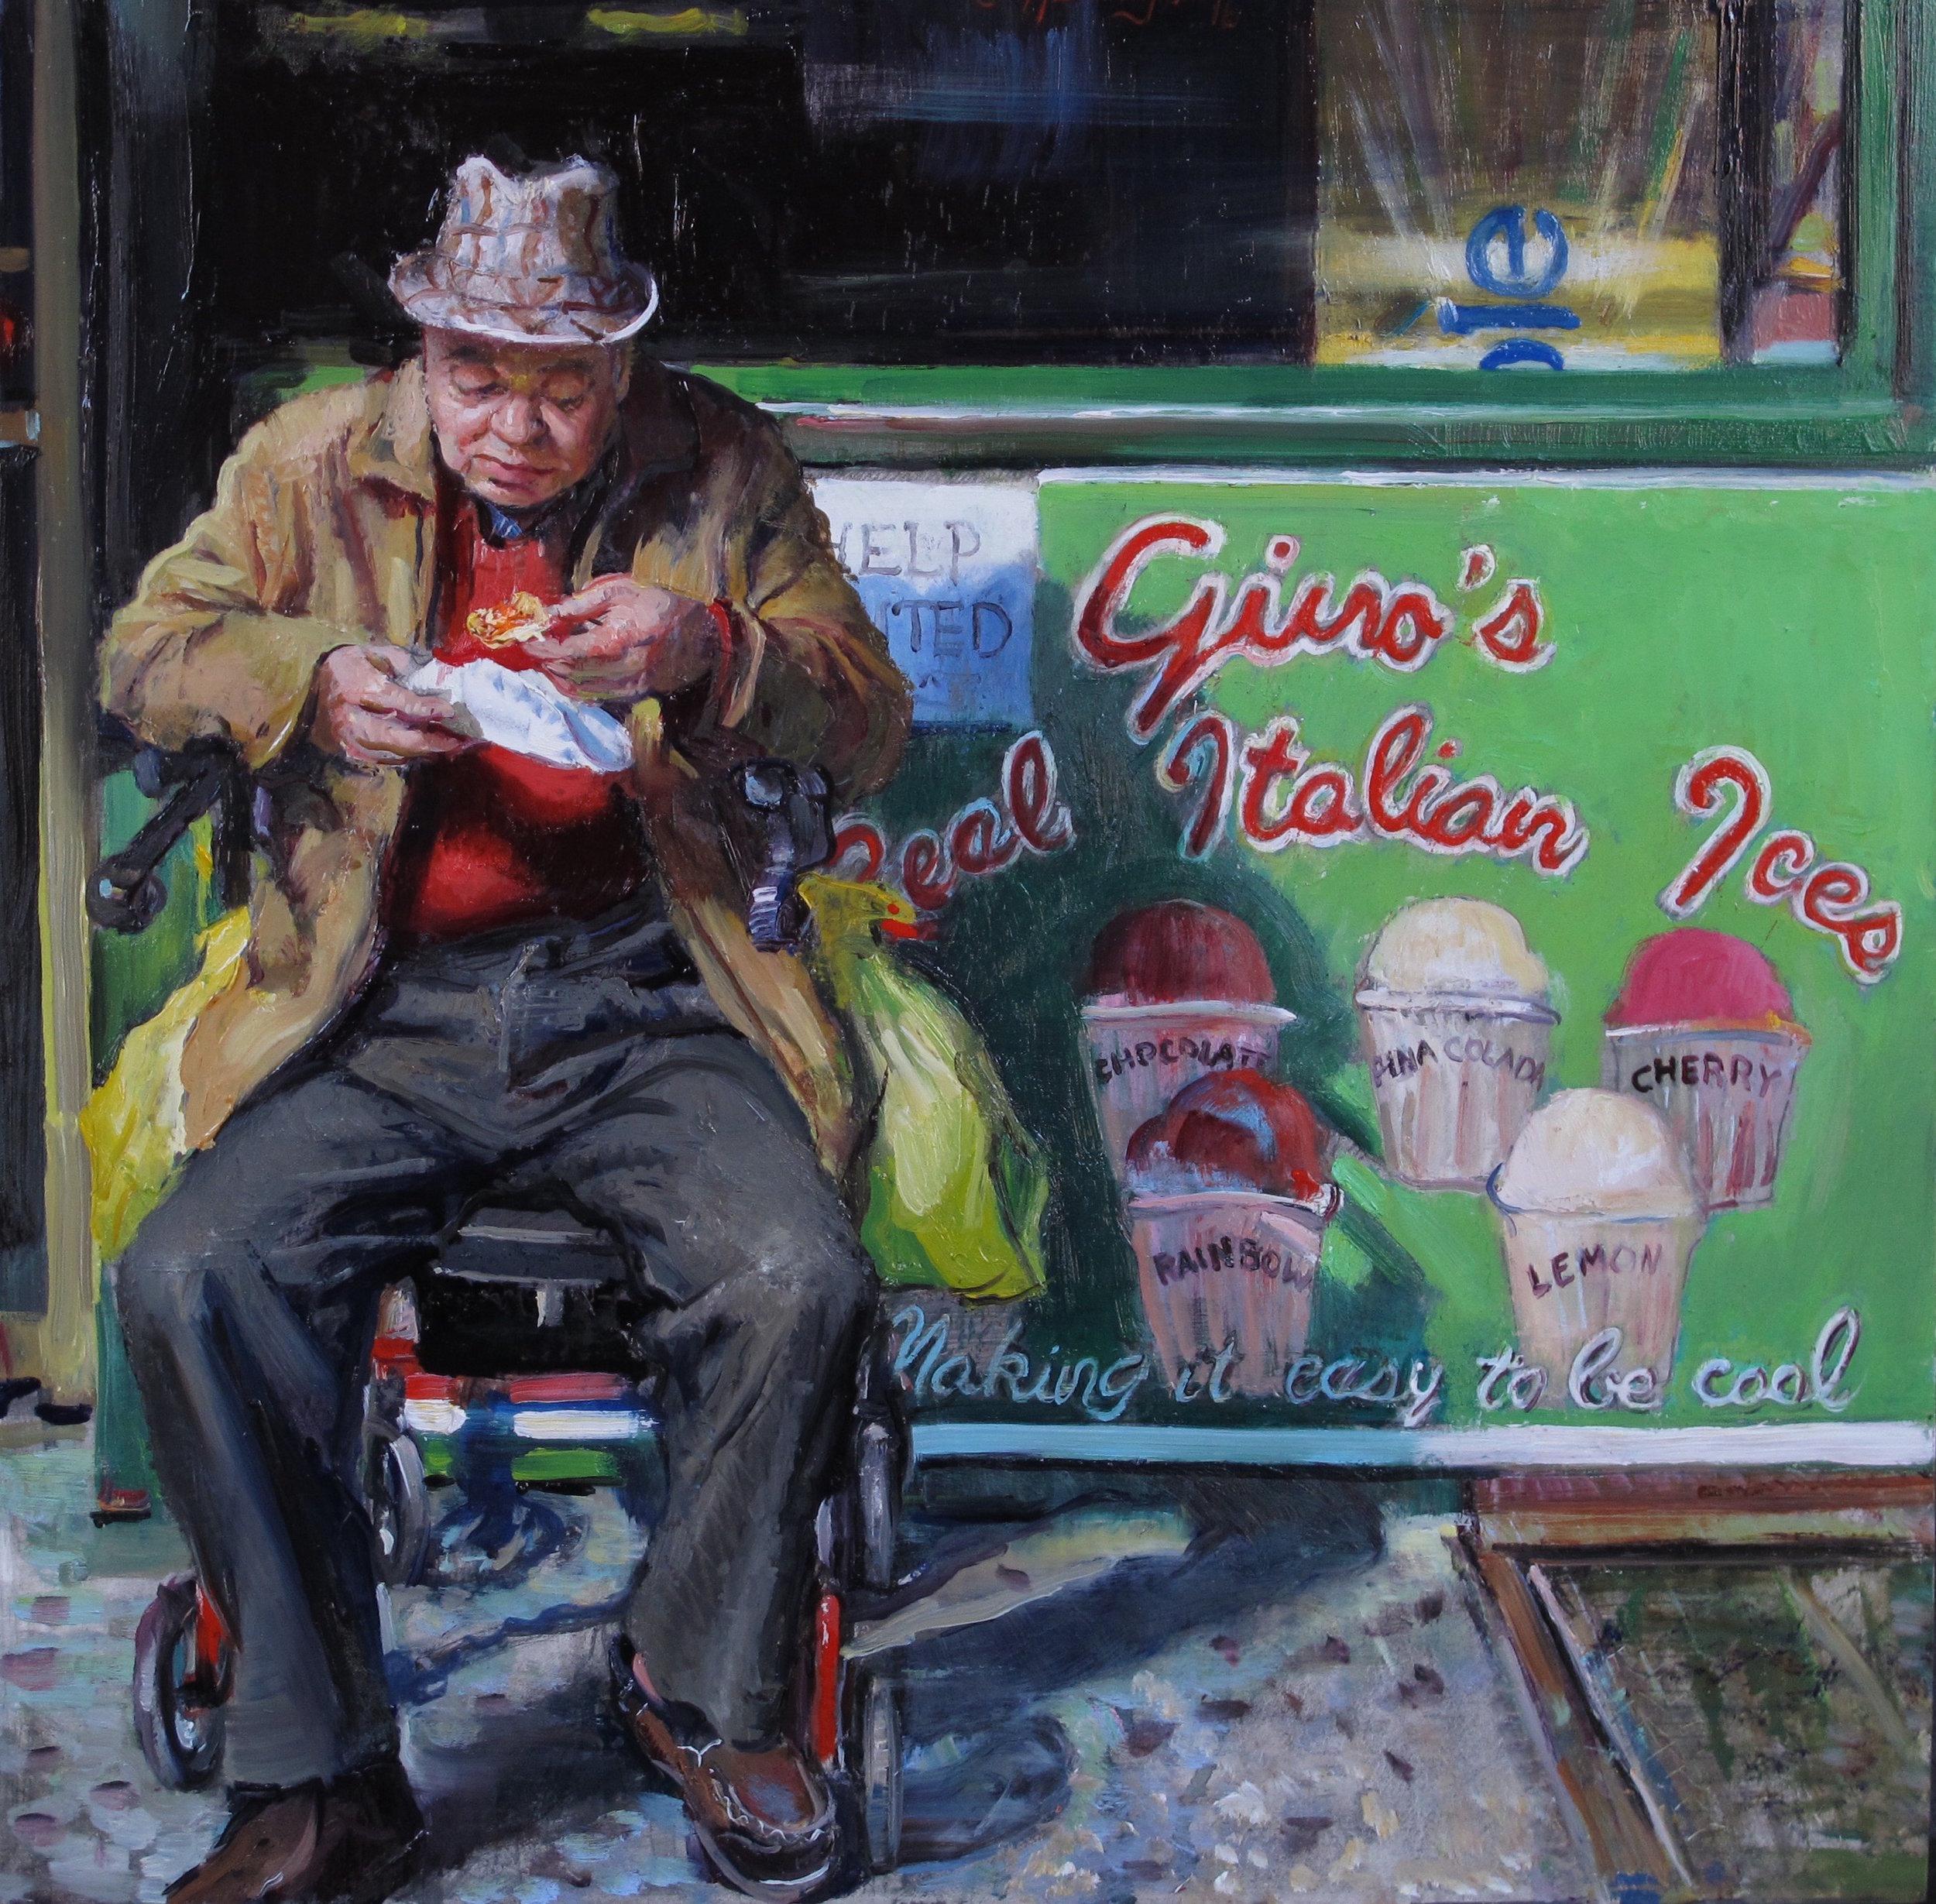 Gino's Italian Ices